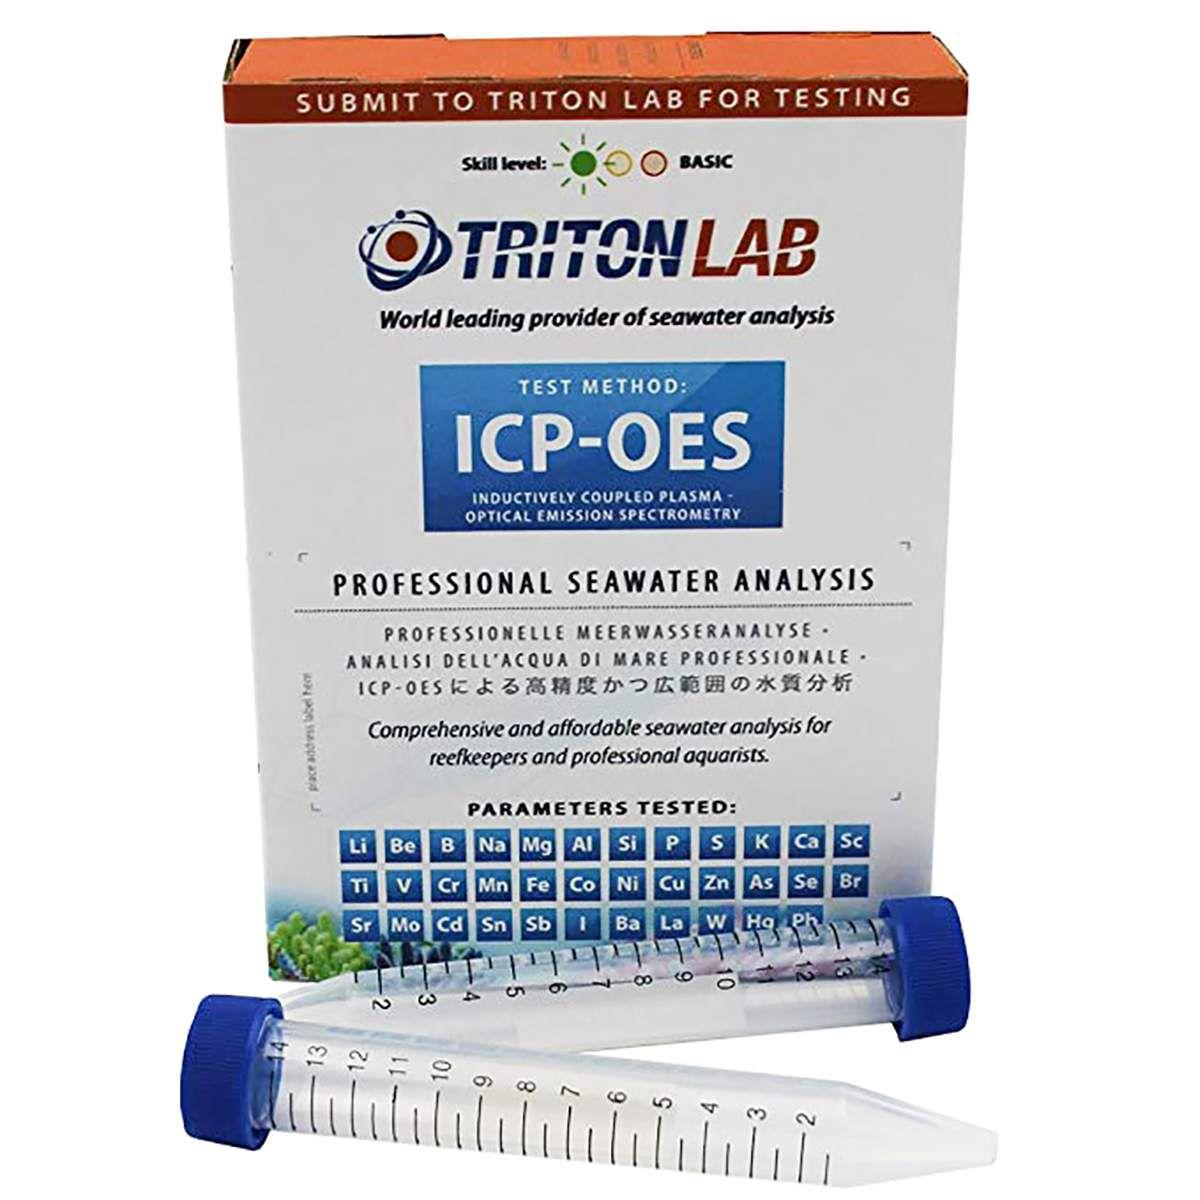 TRITON - ICP-OES